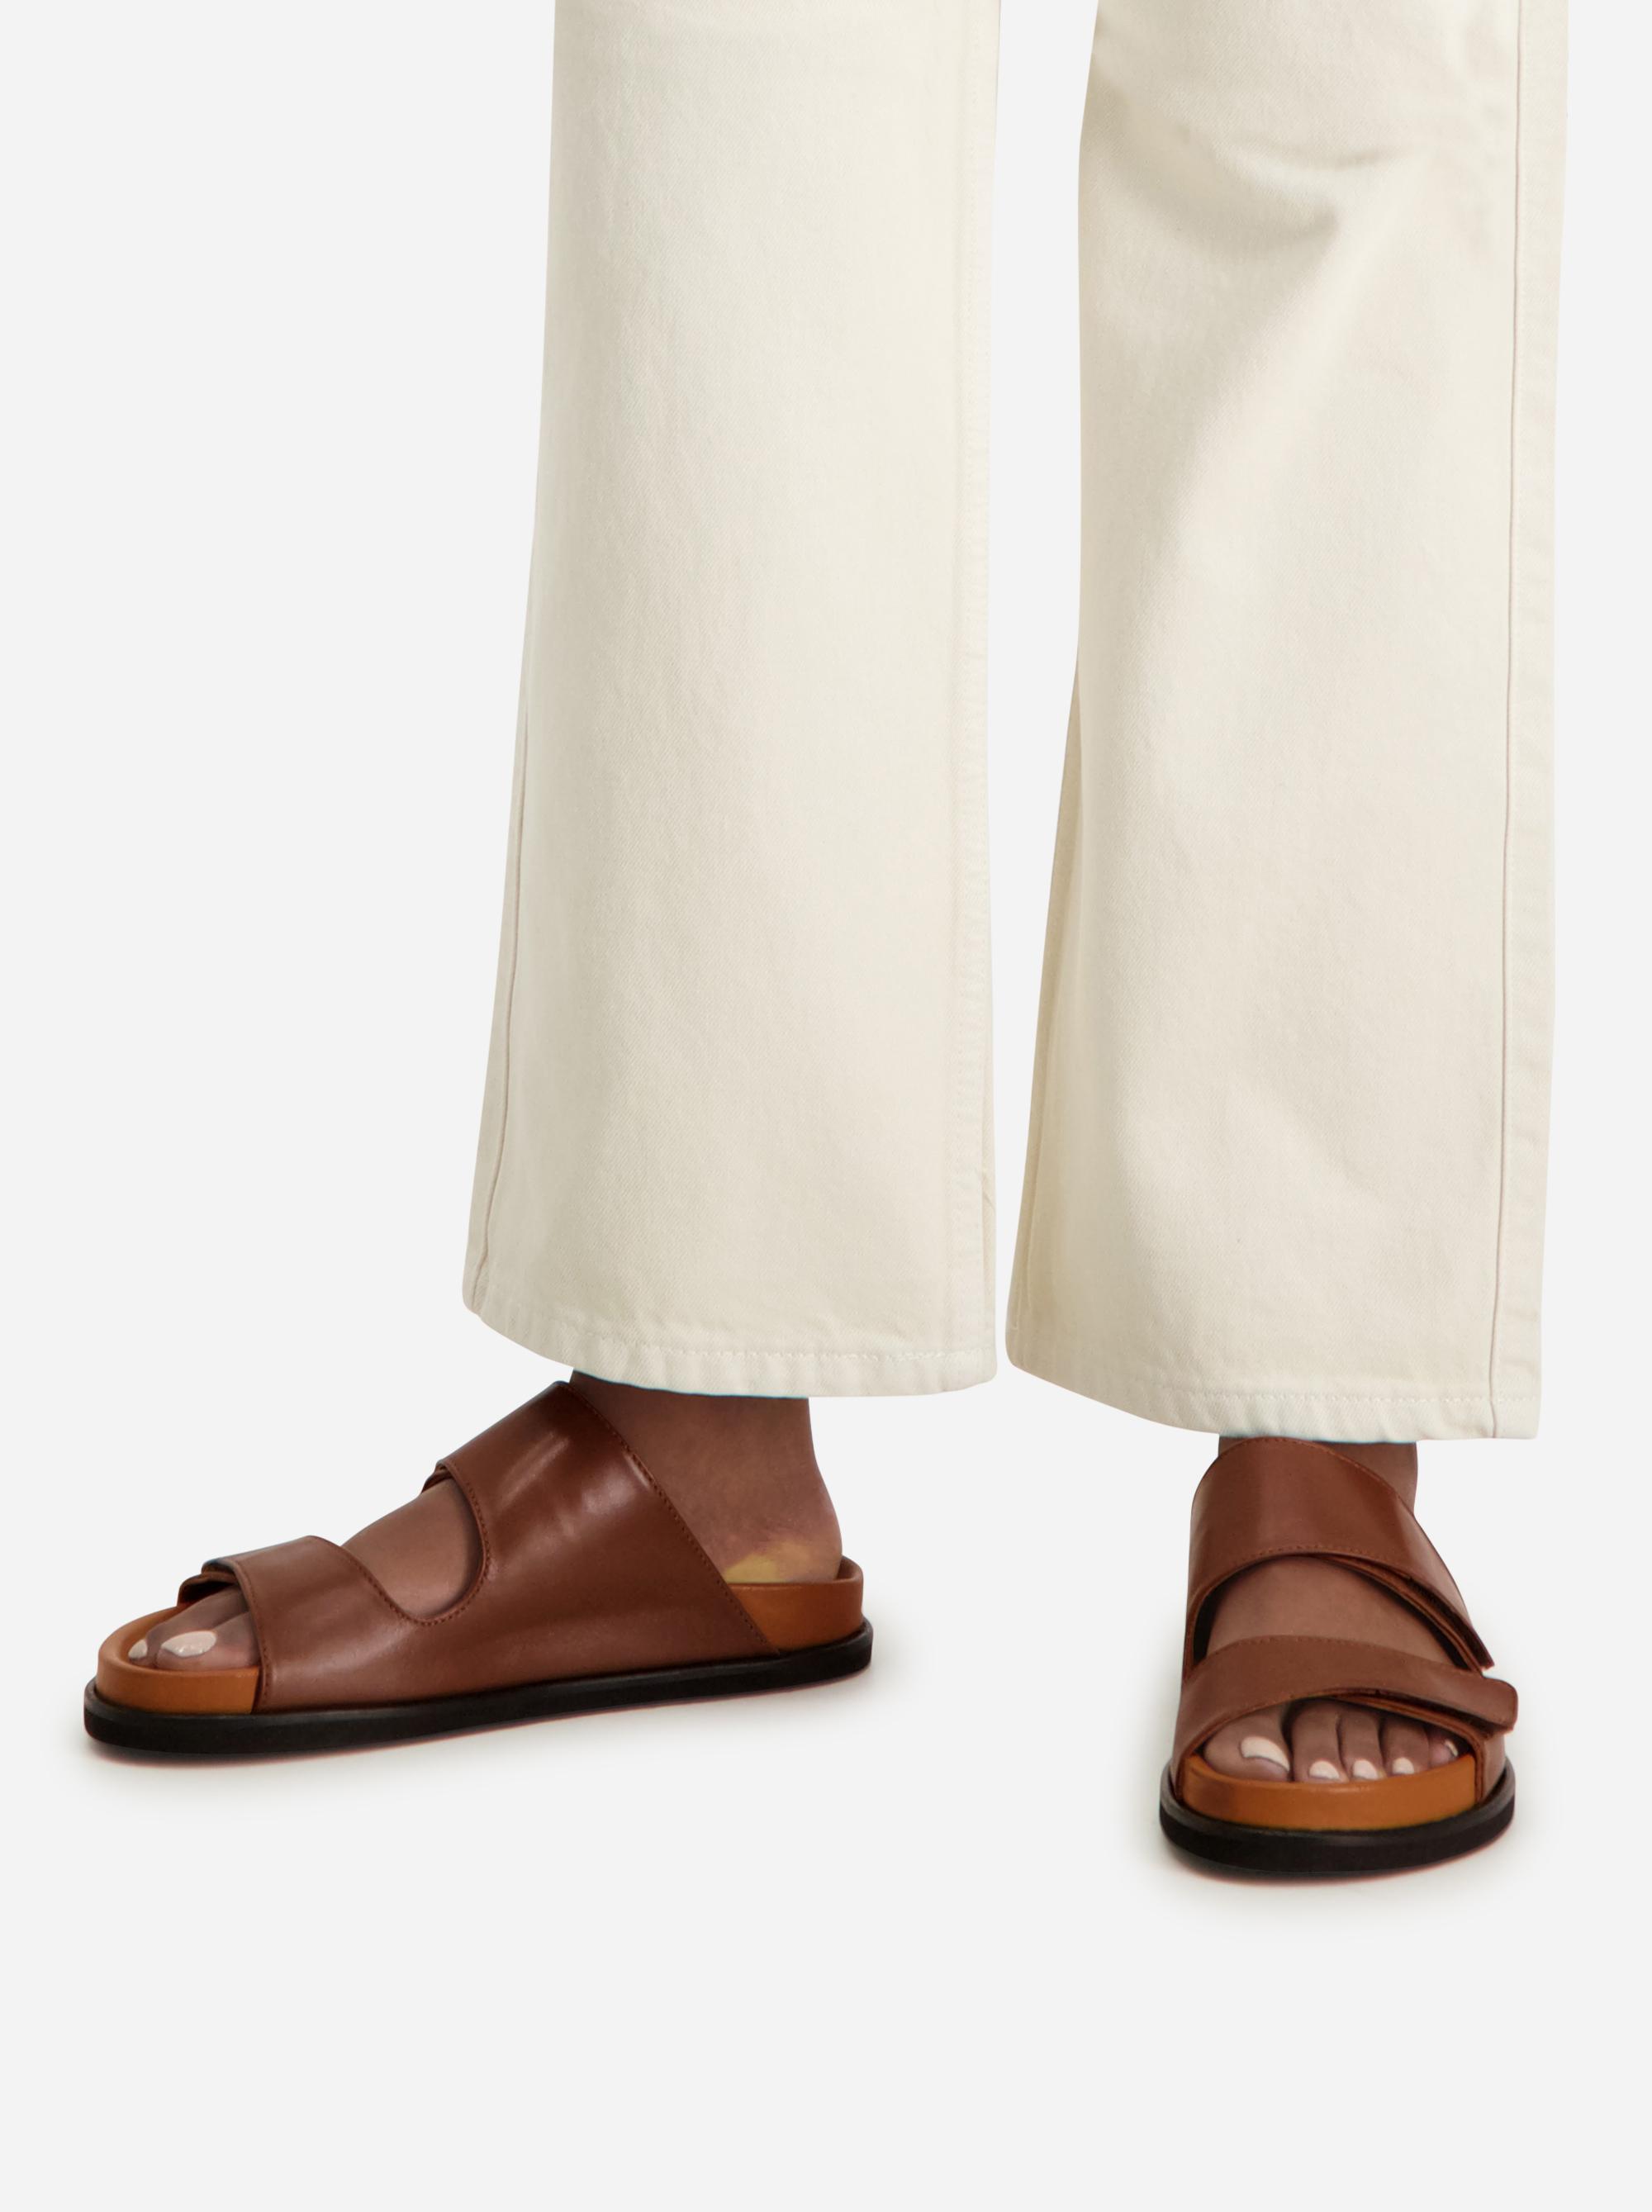 Teym - The Sandal - Women - Brown - 2